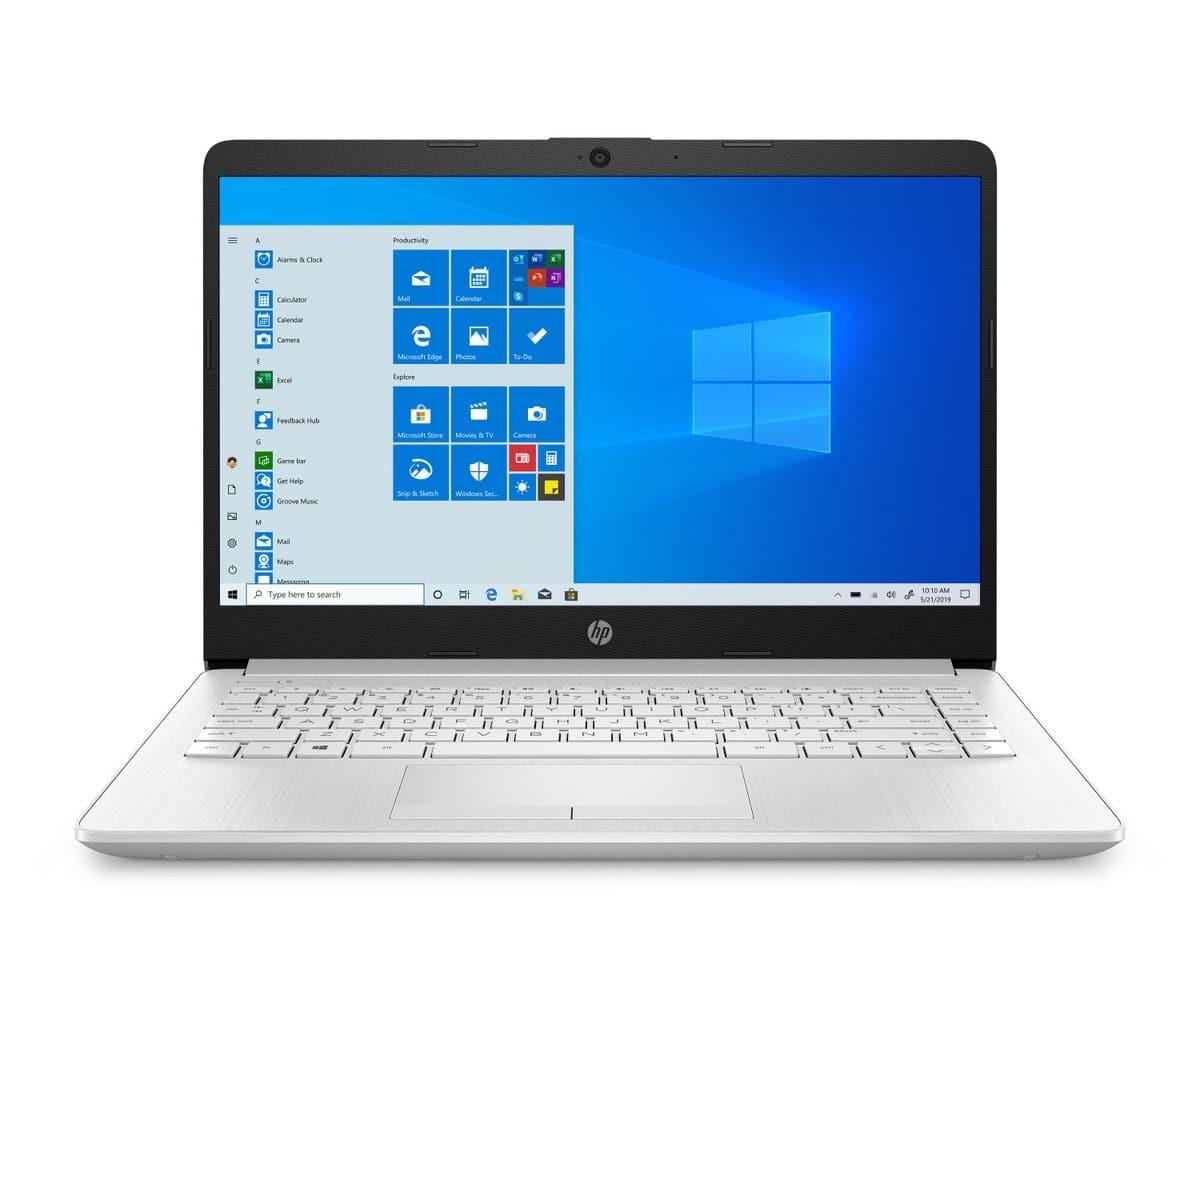 "Portatil HP 14"" Pulgadas 14-cf2074la Intel Core i5- 8 GB RAM- Disco Estado Sólido 256GB-Plateado"